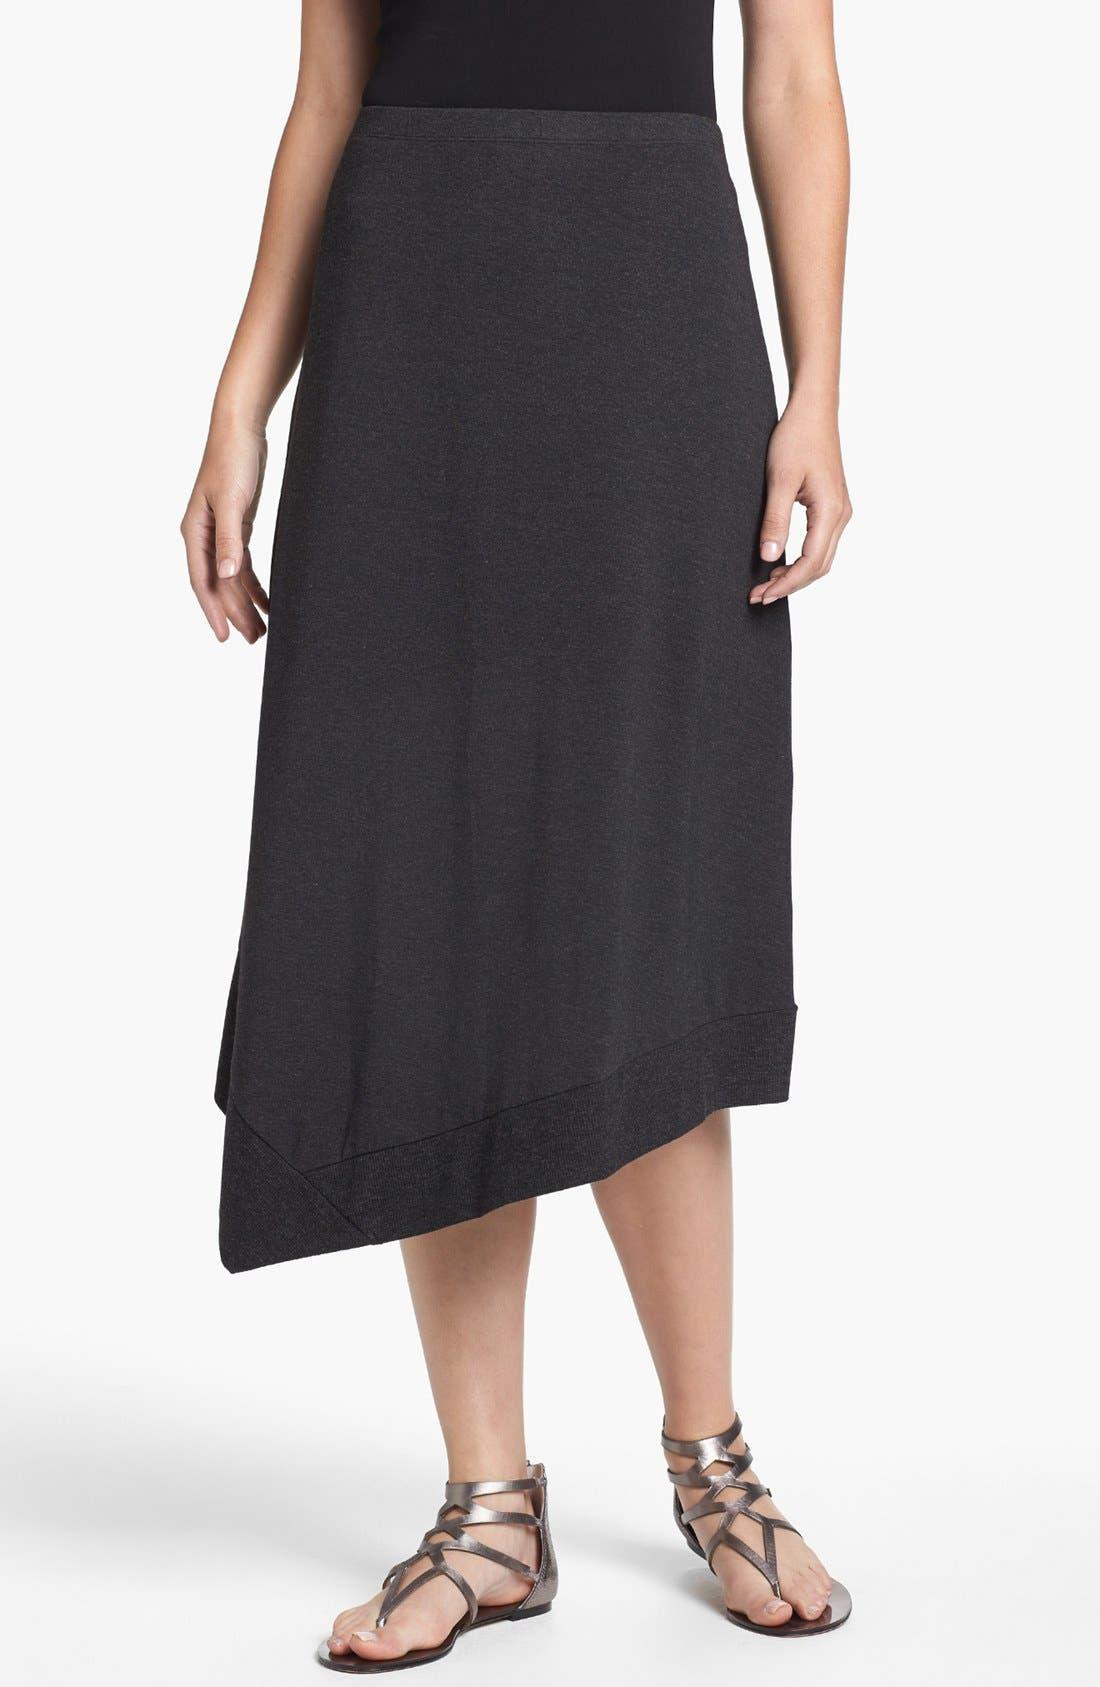 Alternate Image 1 Selected - Eileen Fisher Asymmetrical Jersey Midi Skirt